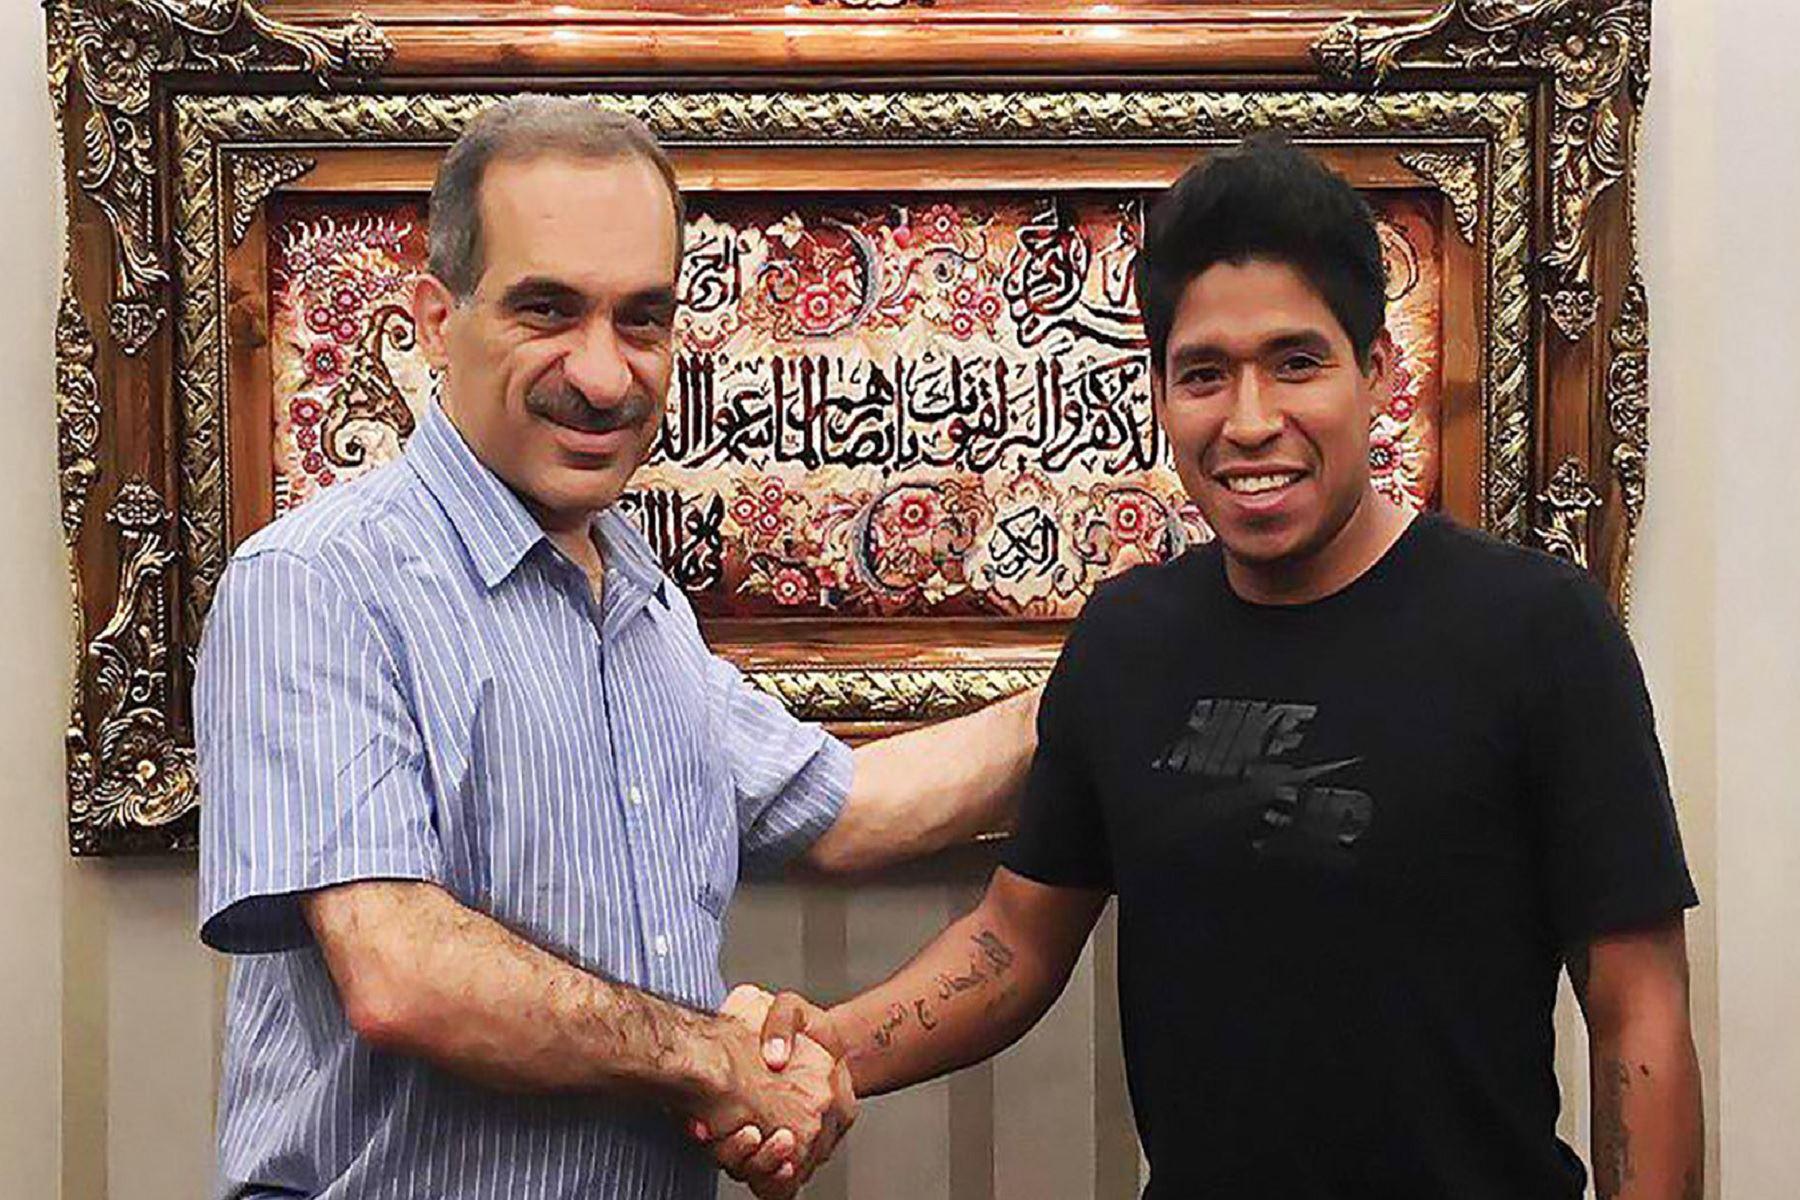 El peruano Williams Mimbela jugará en Irán. Foto: Tractor Sazi FC